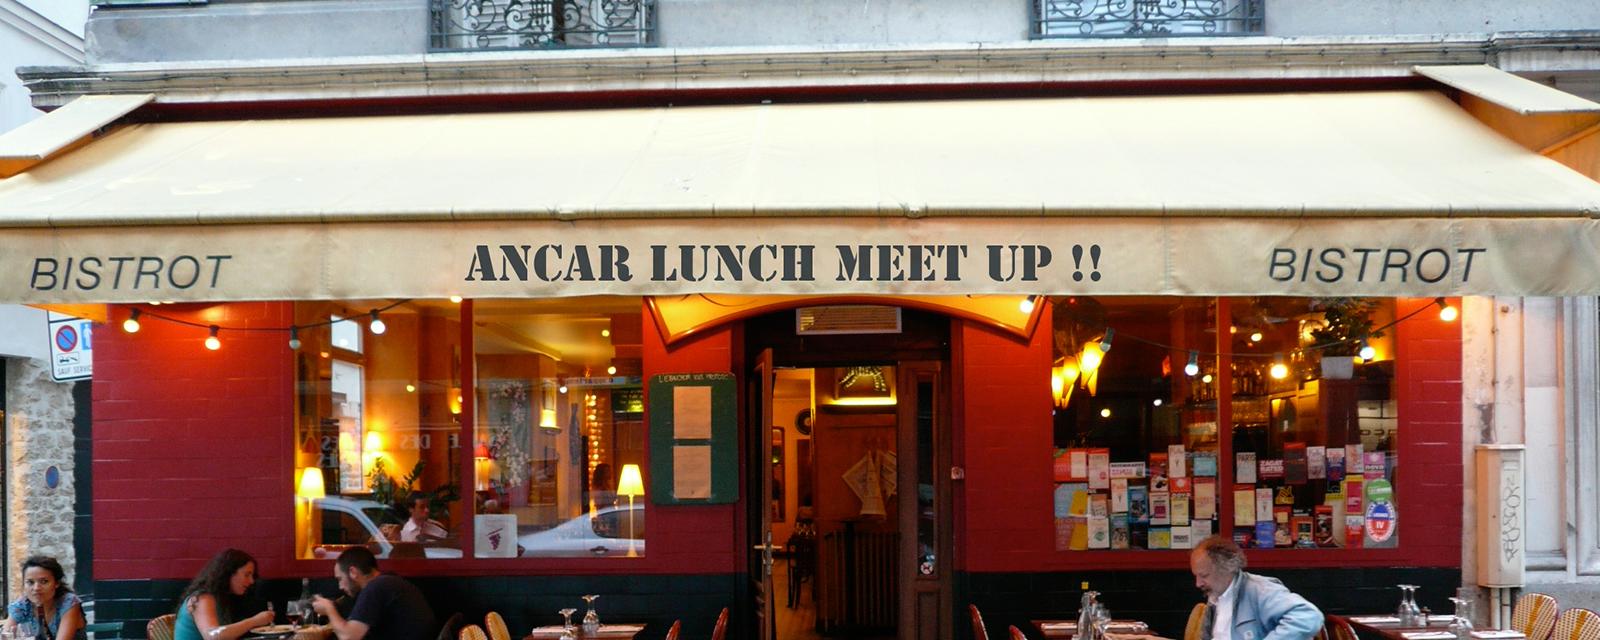 Ancar Lunch Meet up !